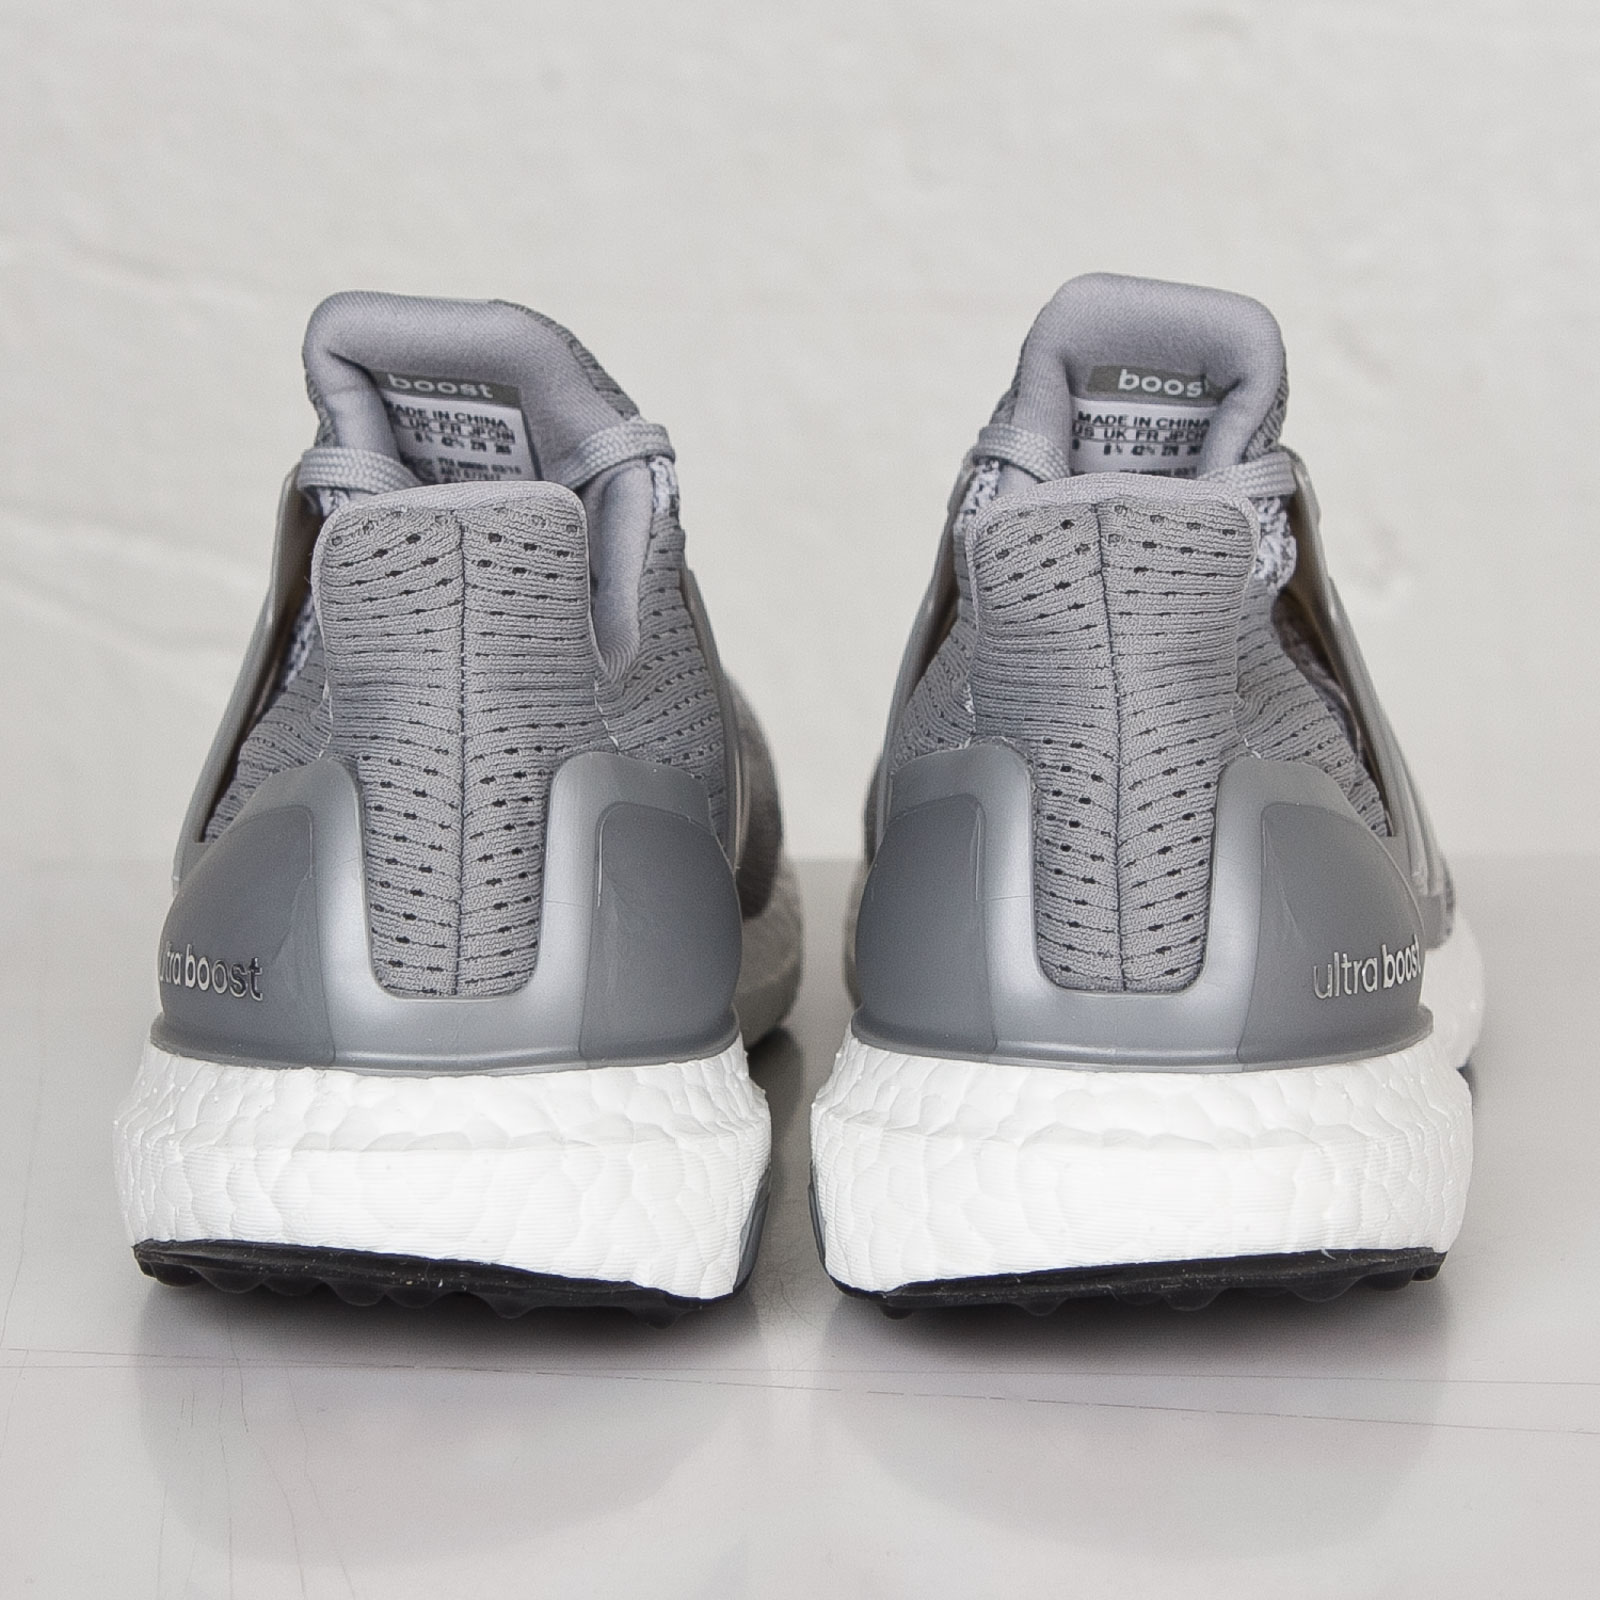 Adidas Nuevo Boost vit